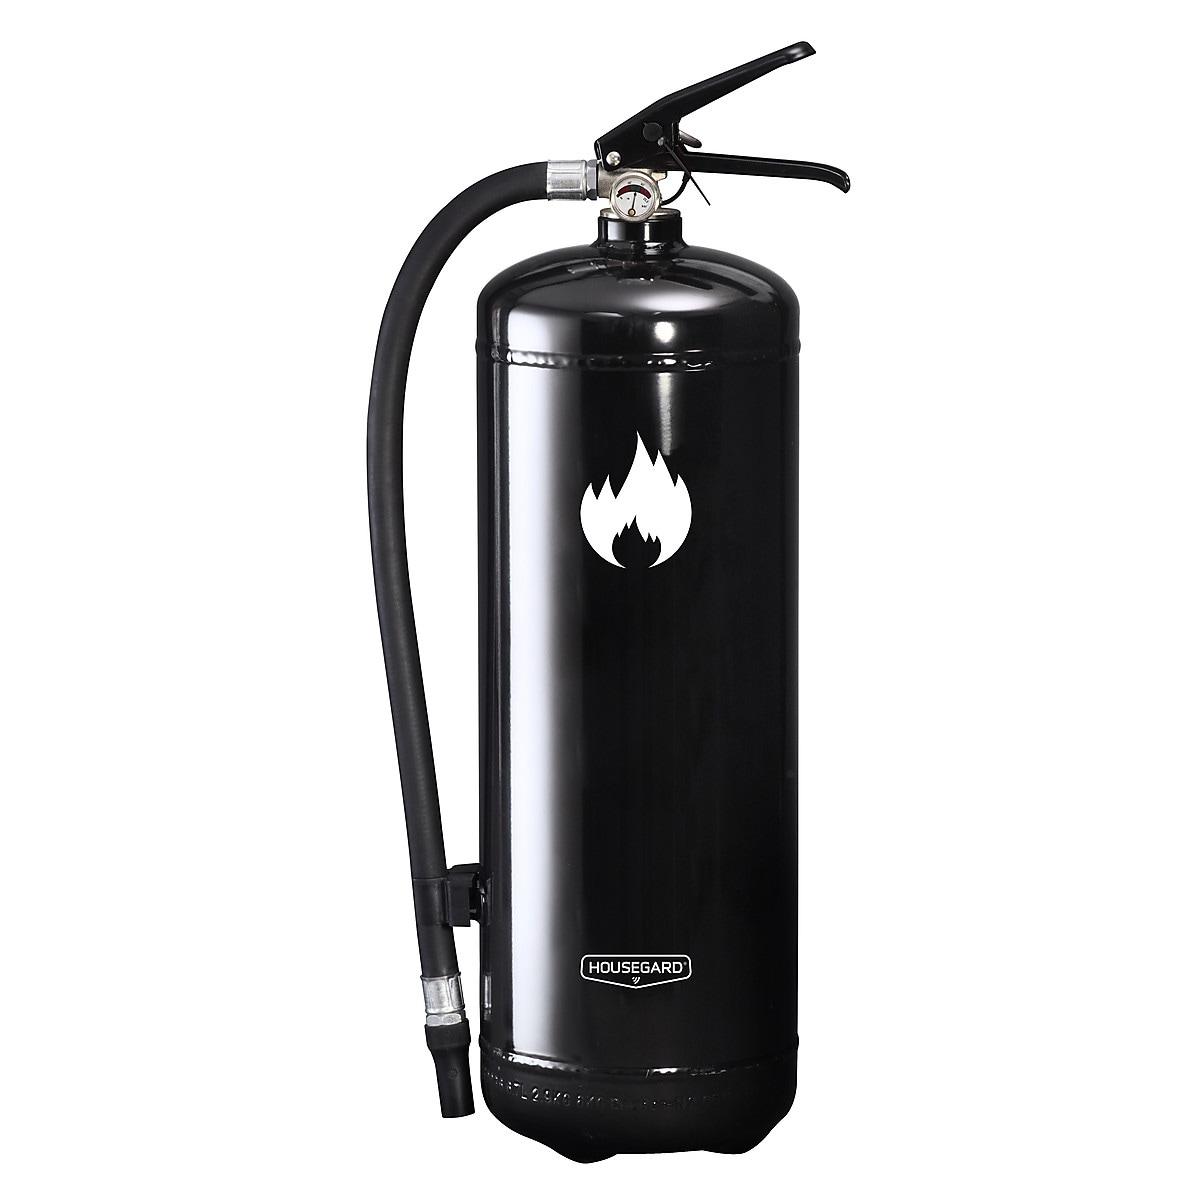 Brandsläckare 6 kg Housegard Design Edition